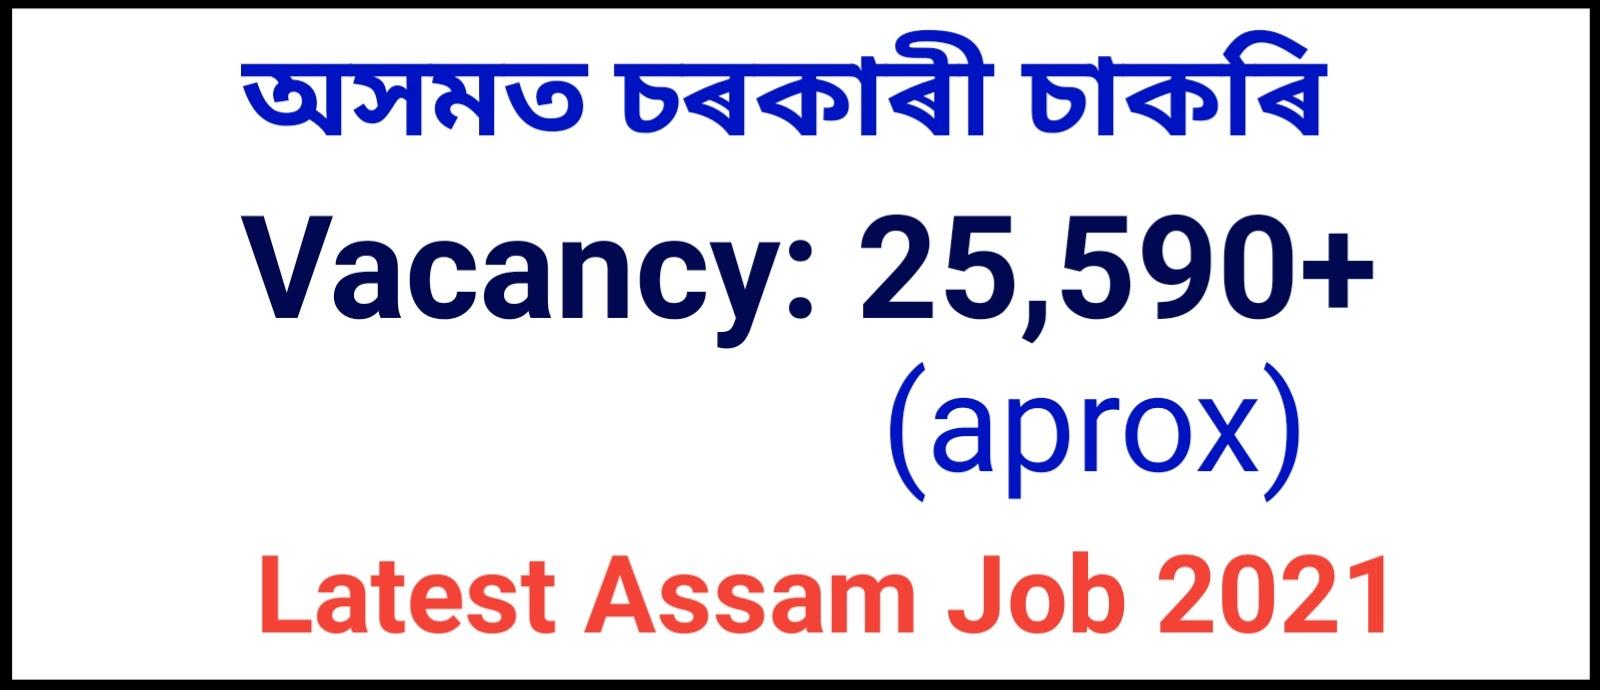 Latest Assam Job 2021: Apply for 25,590+ Vacancies